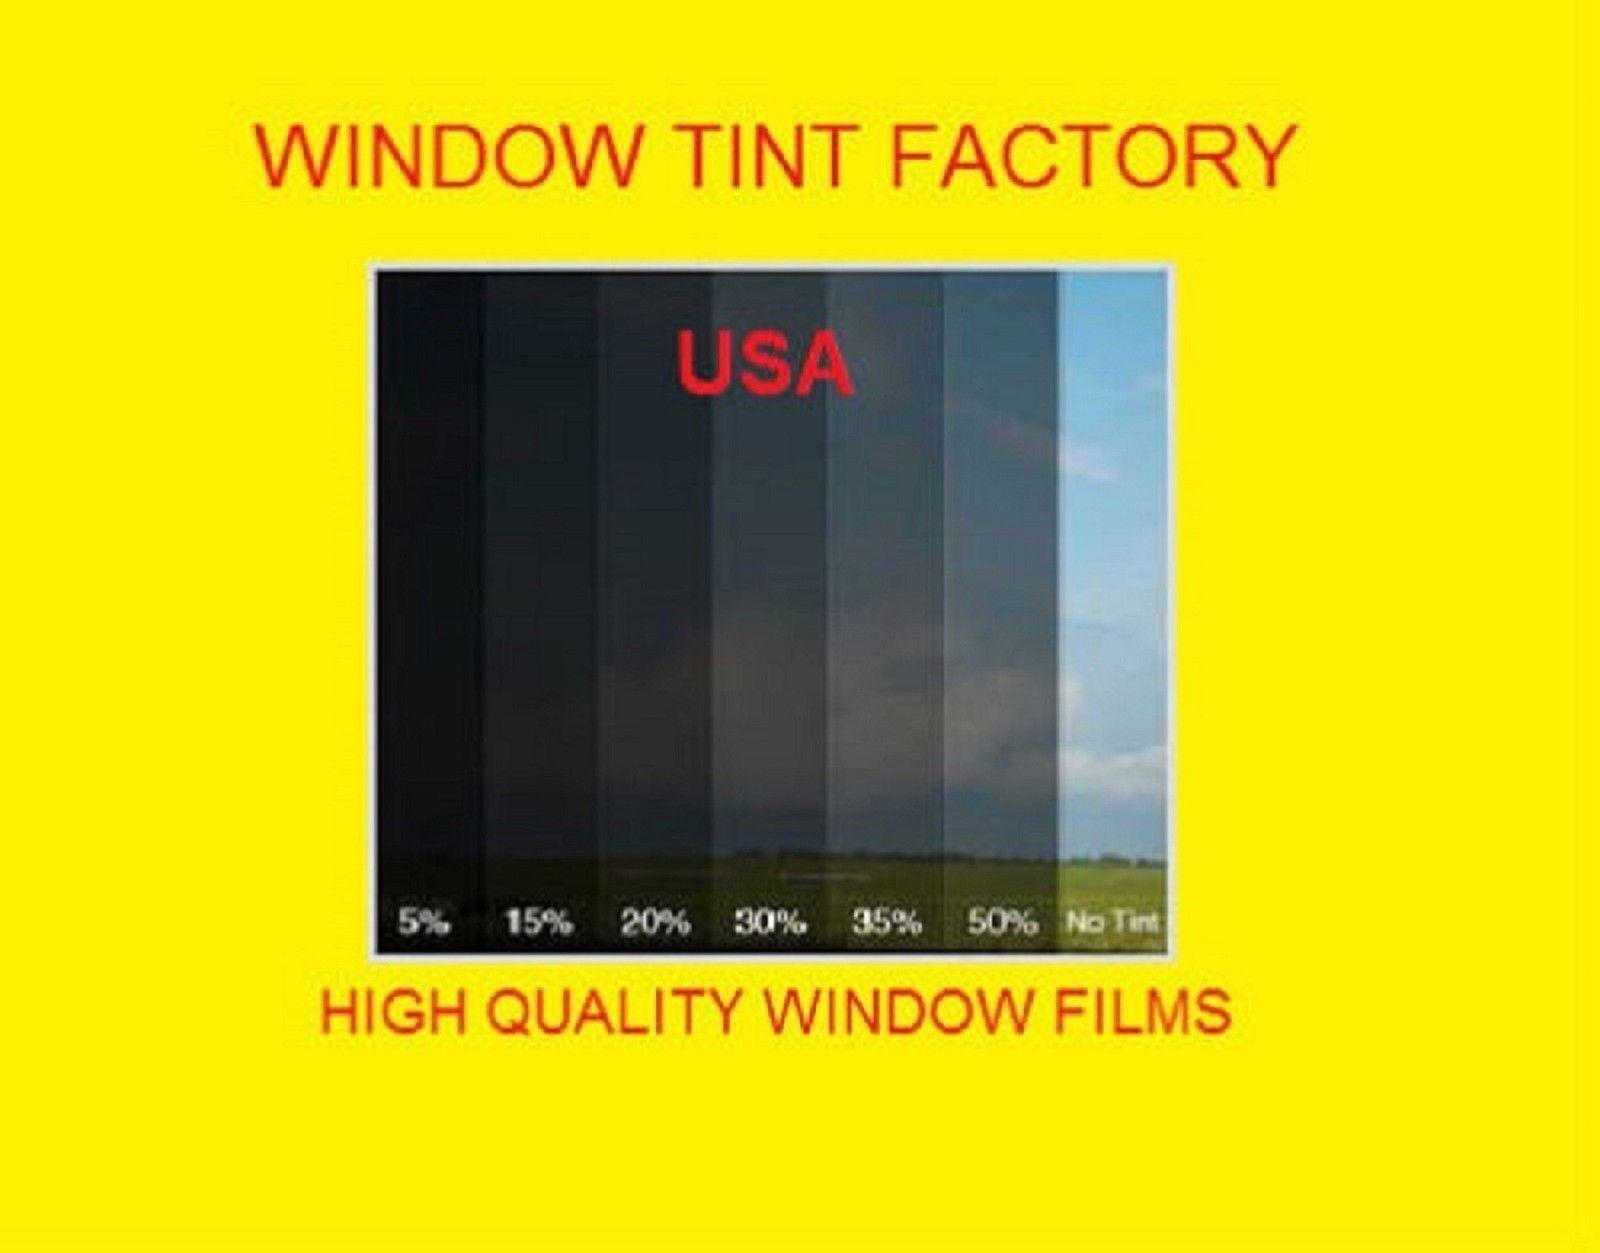 Window film Tint 2 ply  high quality 20% Medium  Carbon  Intersolar® 48  x 50 FT